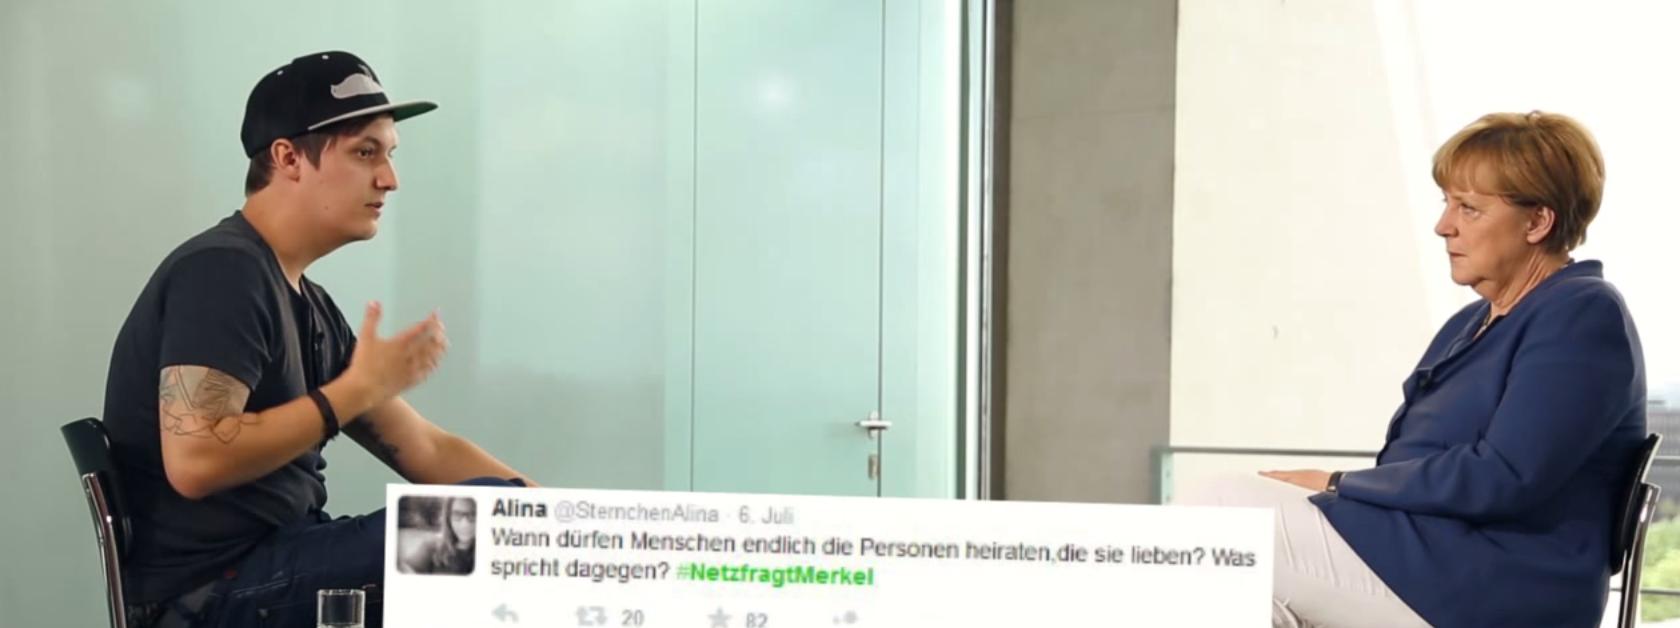 #NetzFragtMerkel